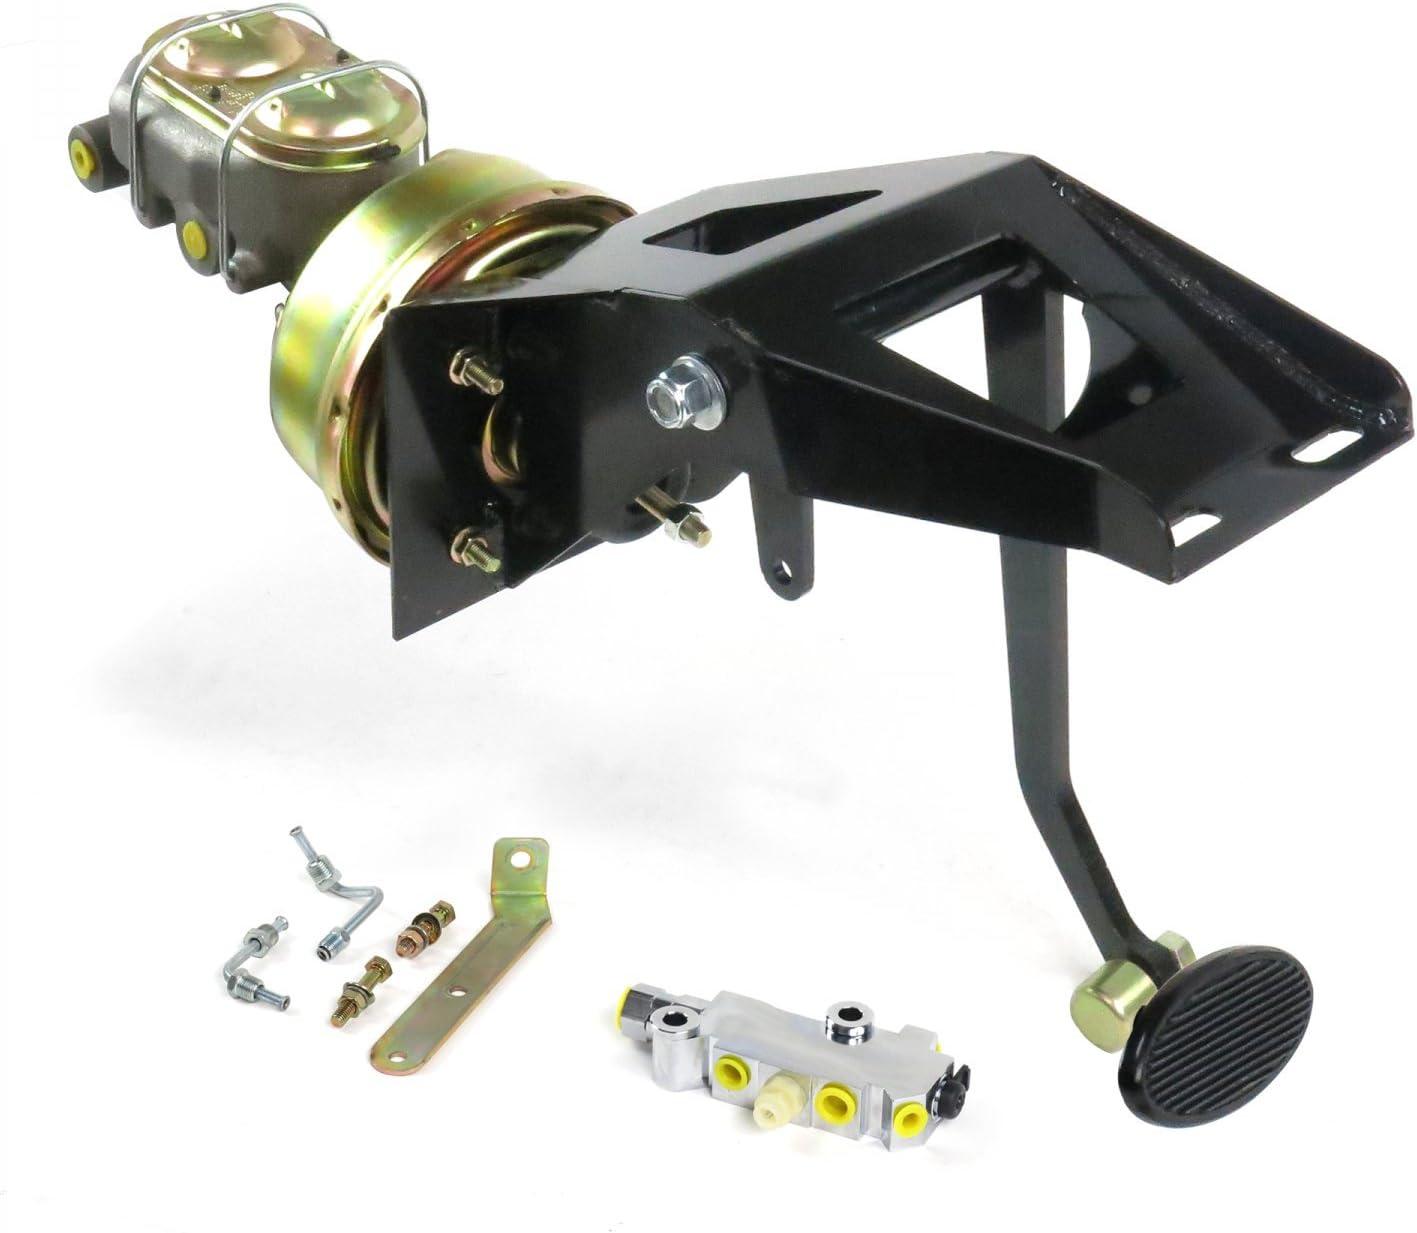 "Helix 324965 53-56 Ford Truck FW 7/"" Single Brake Pedal kit Adj Disk~Lg Oval Blk Pad"